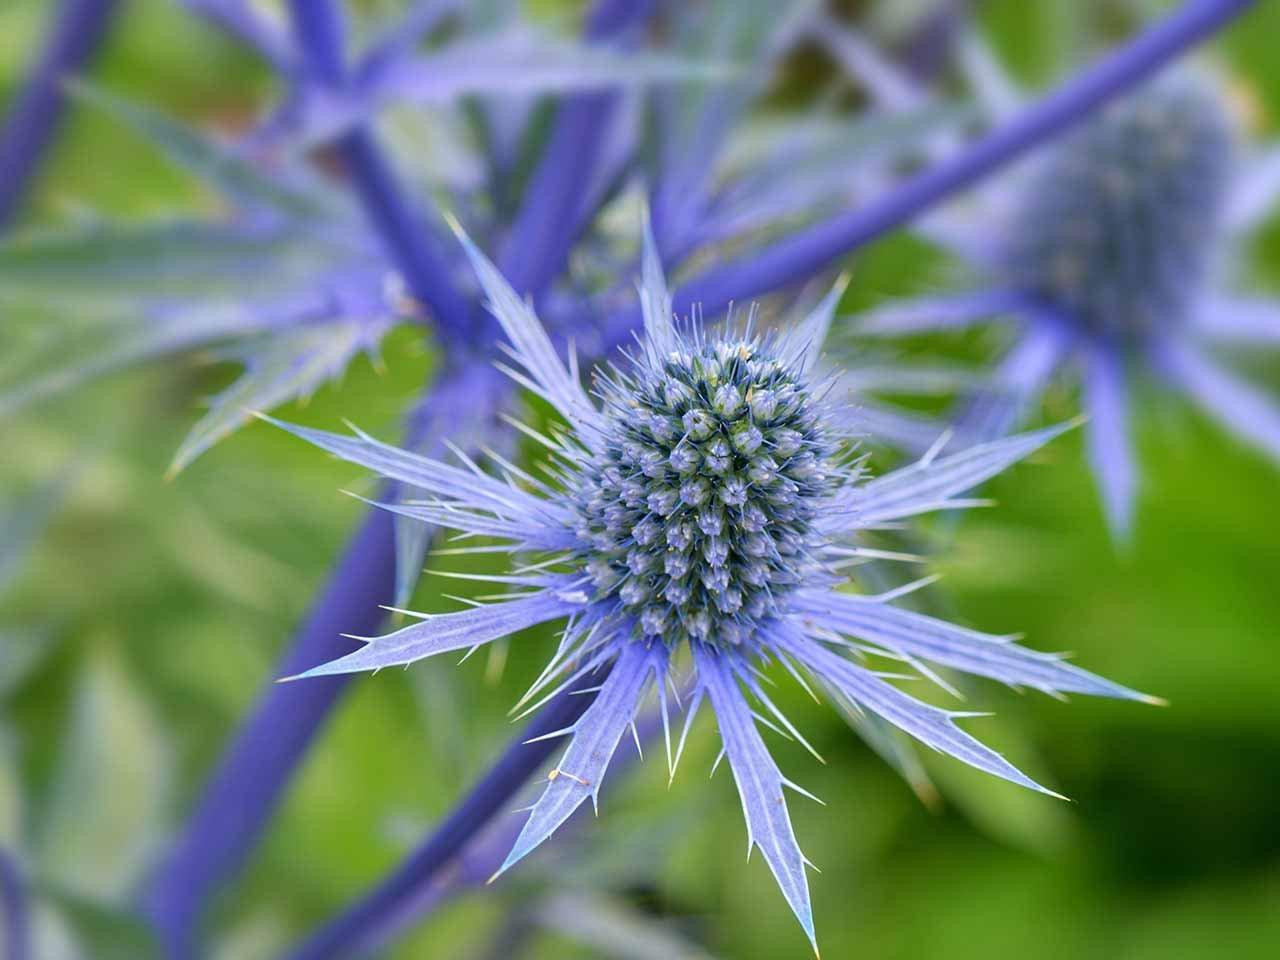 Cheap 200 sea holly blue flower seeds eryngium planum cheap 200 sea holly blue flower seeds eryngium planum izmirmasajfo